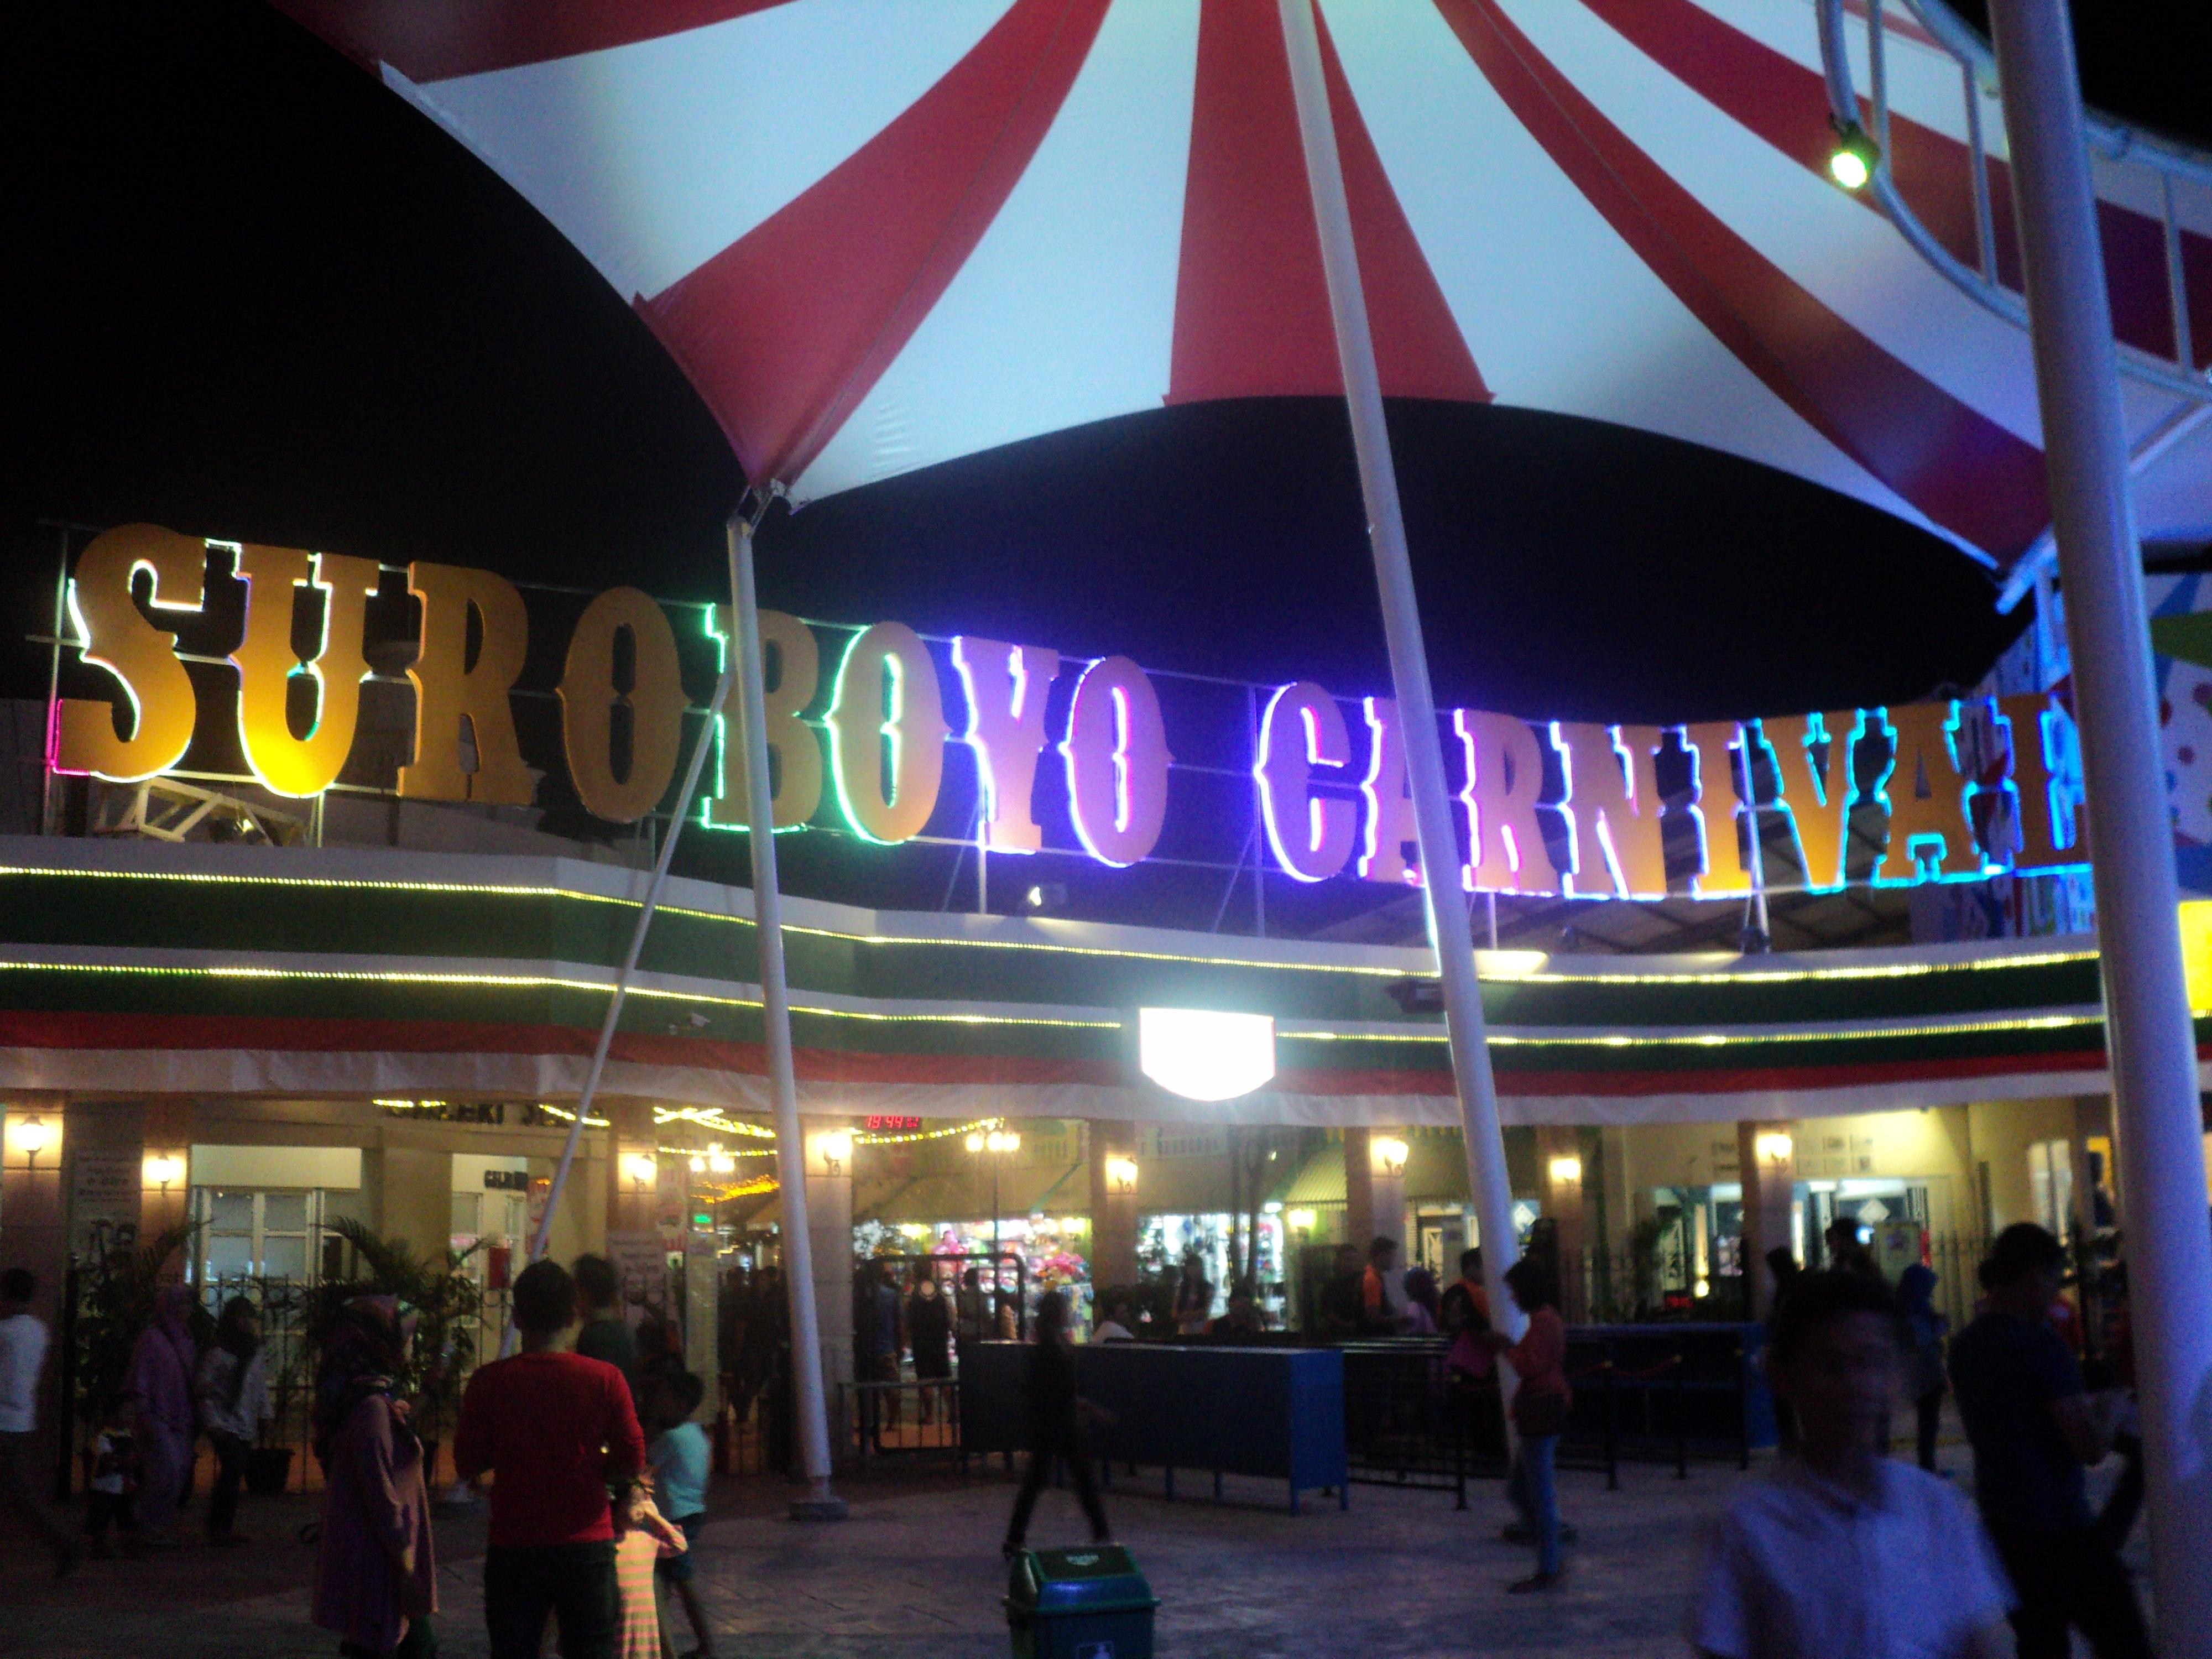 Taman Hiburan Pesona Wisata Surabaya Pintu Masuk Carnival Night Thr